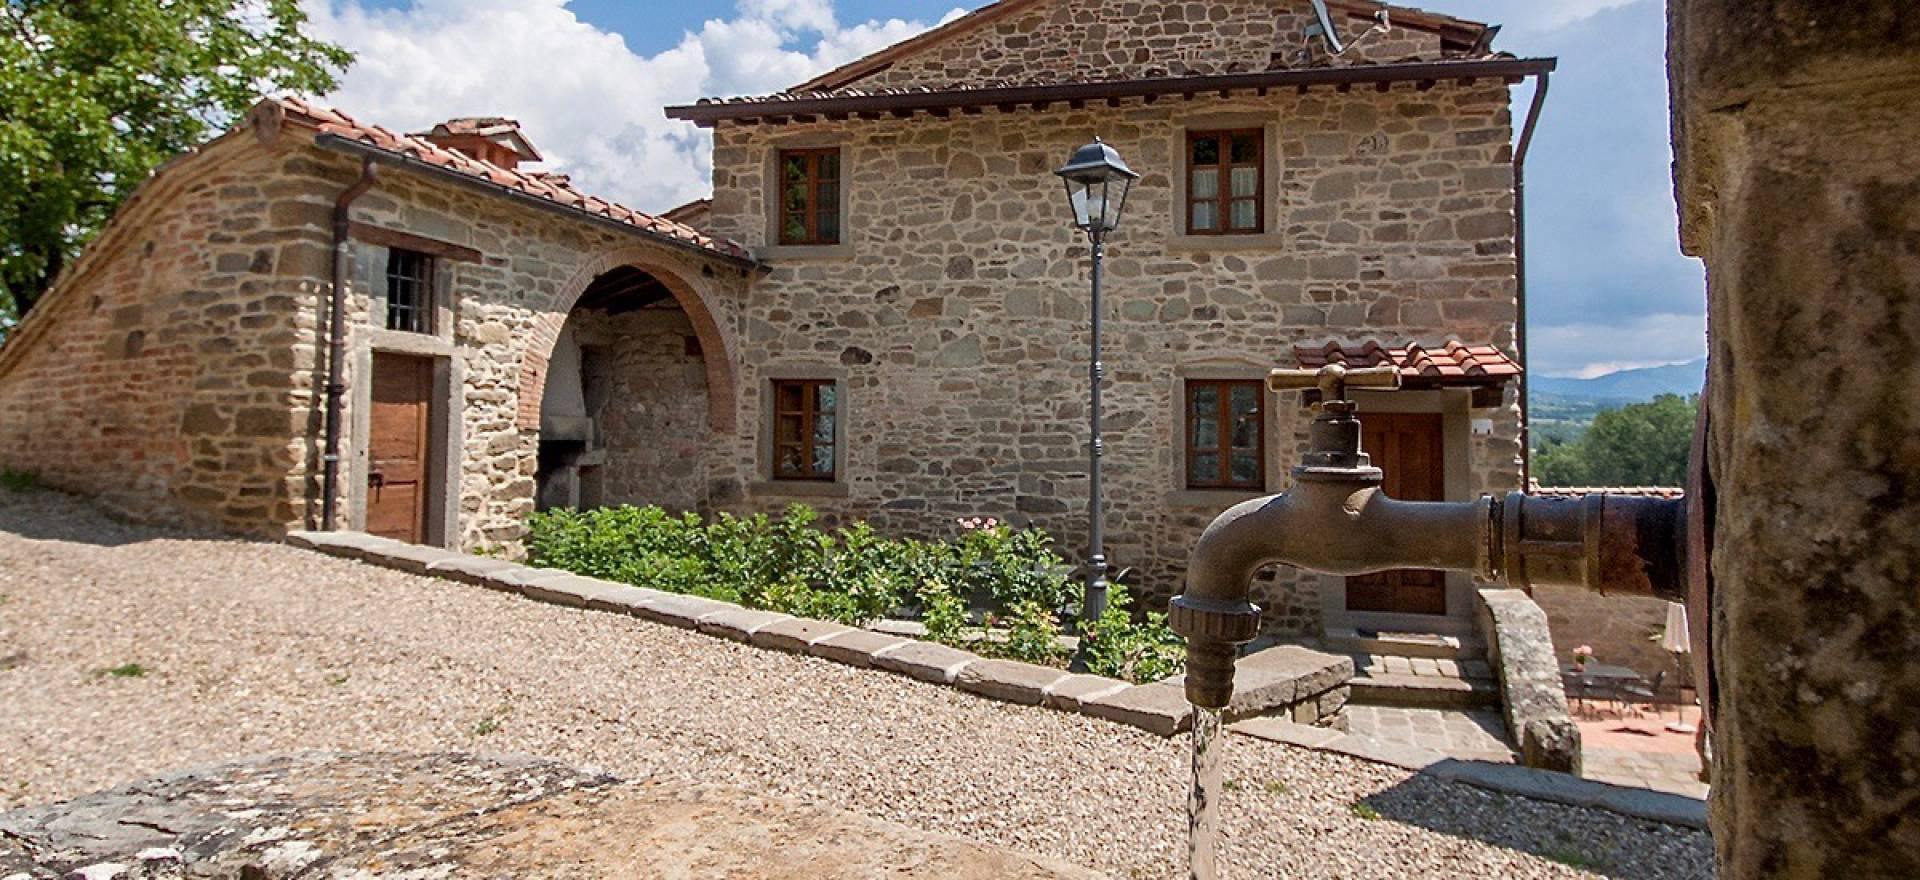 Agriturismo Toscane Agriturismo in Toscane ideaal voor 4 gezinnen